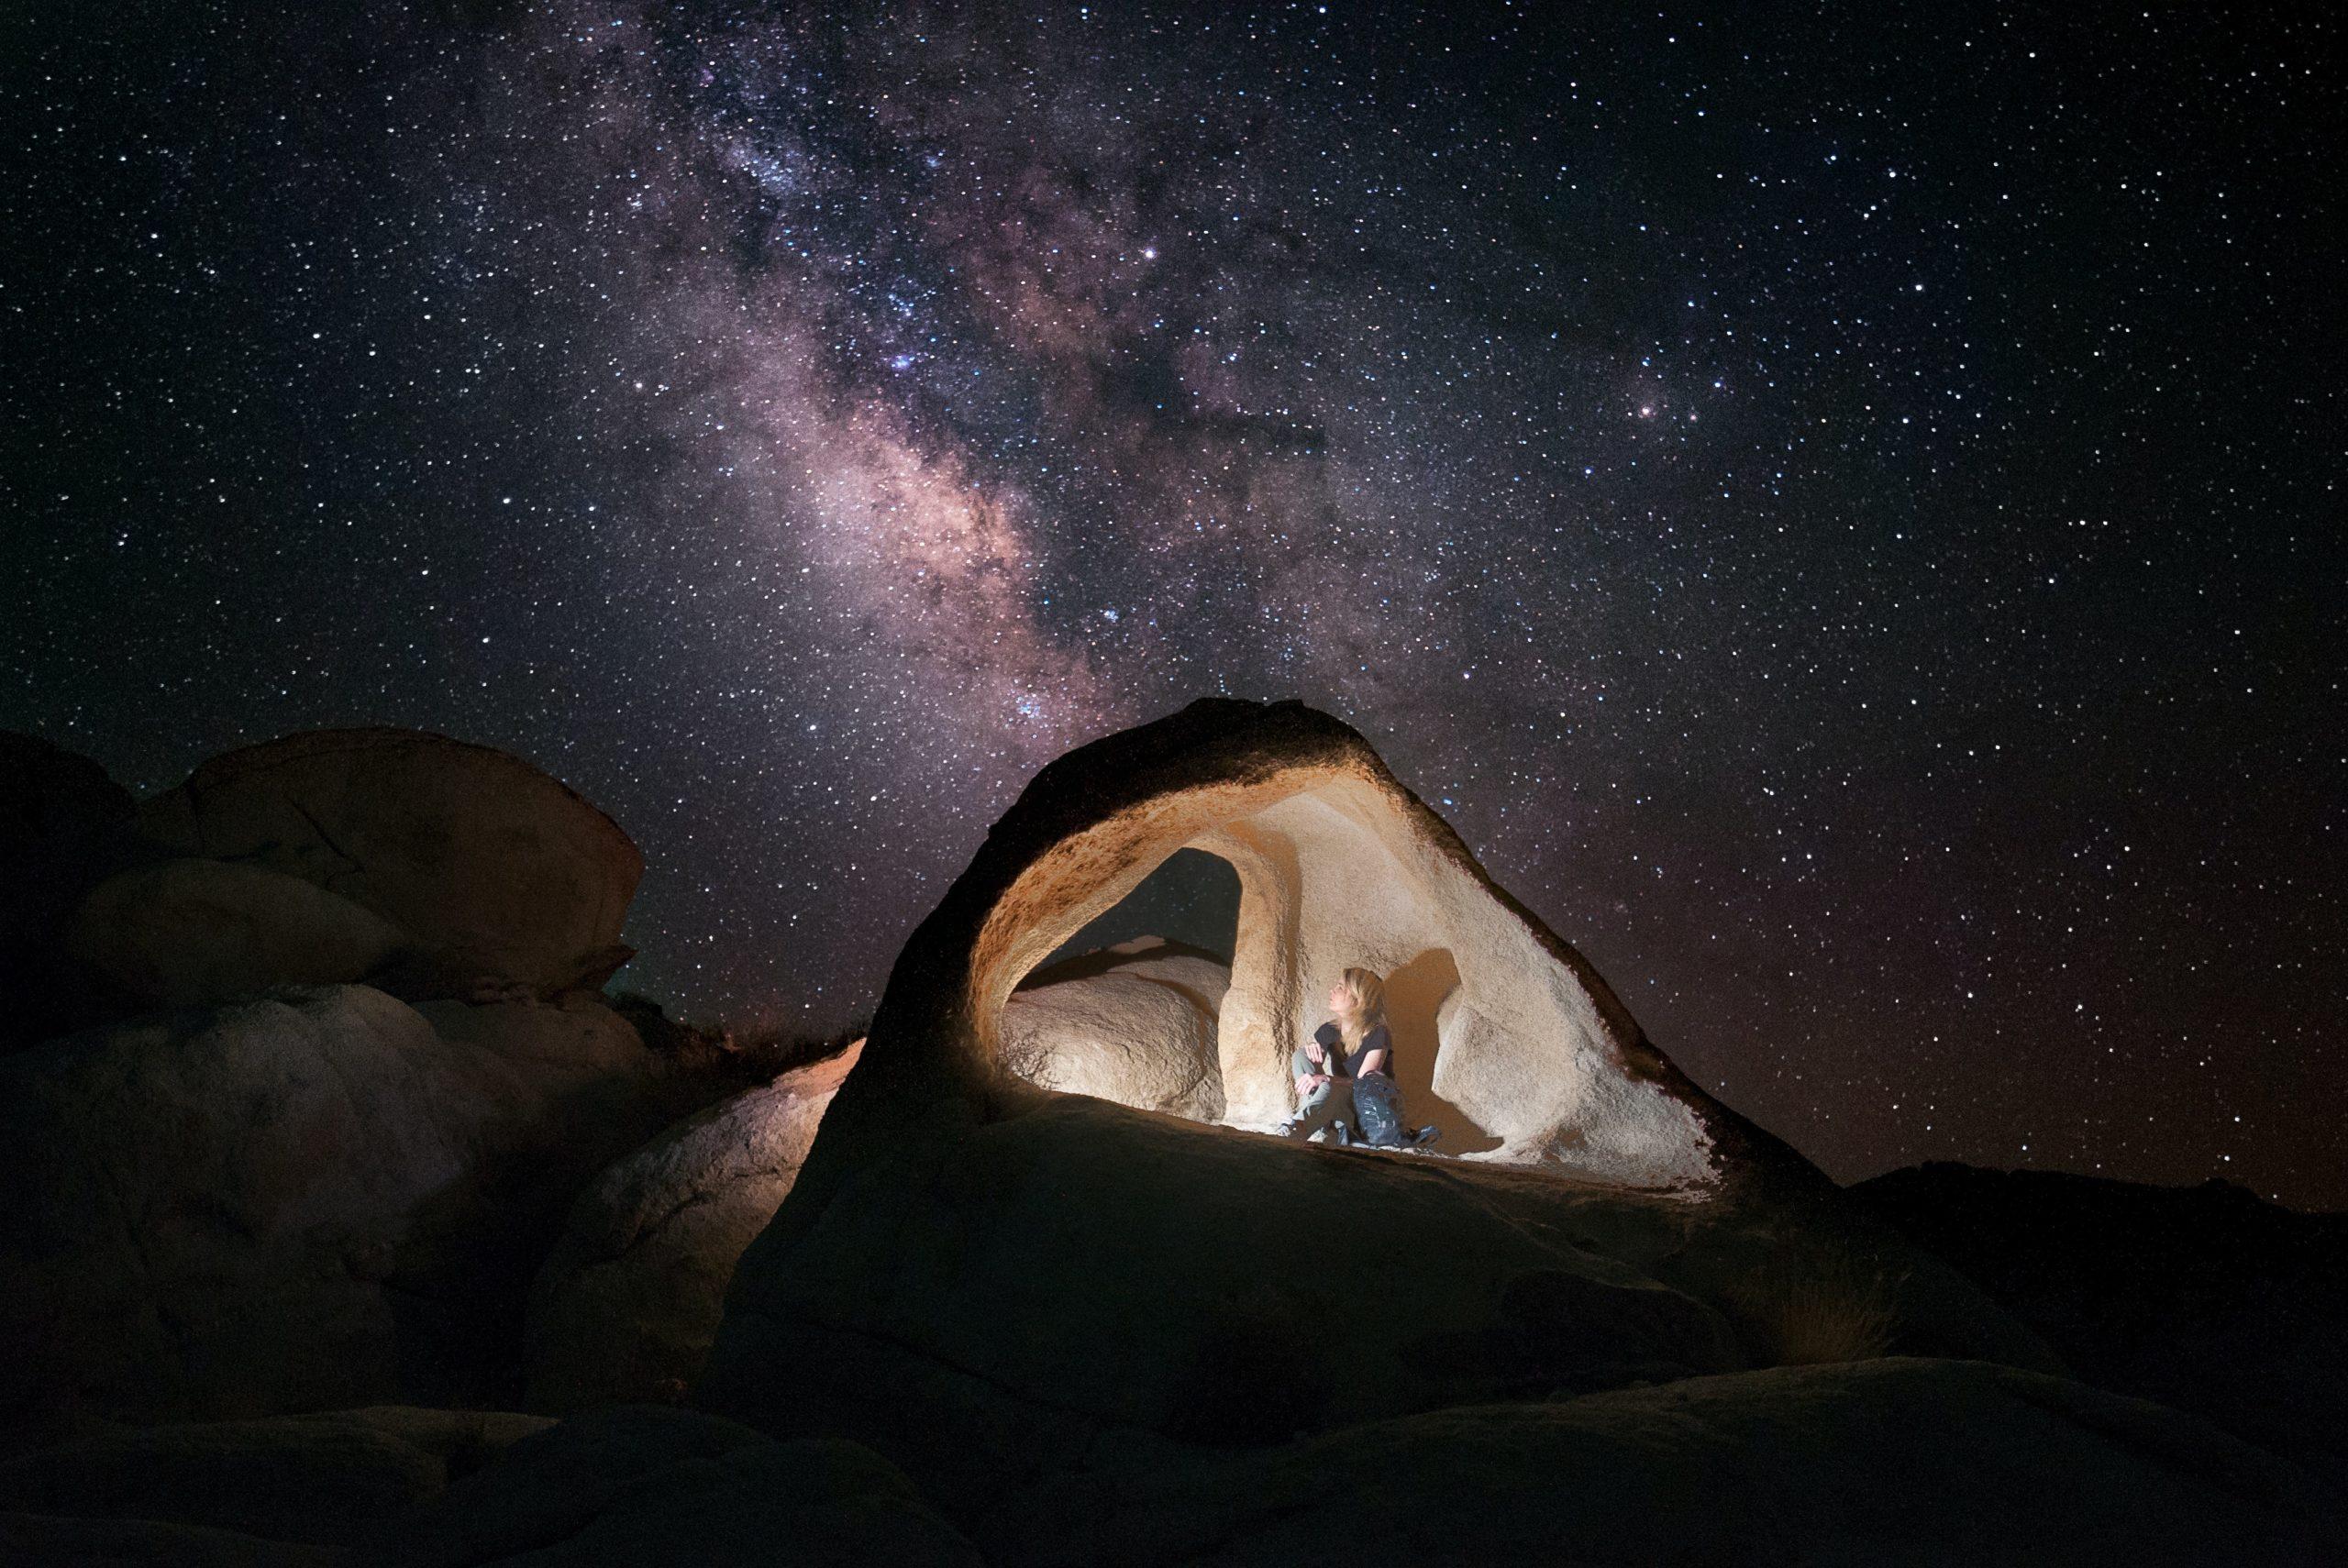 Starry night in Joshua Tree